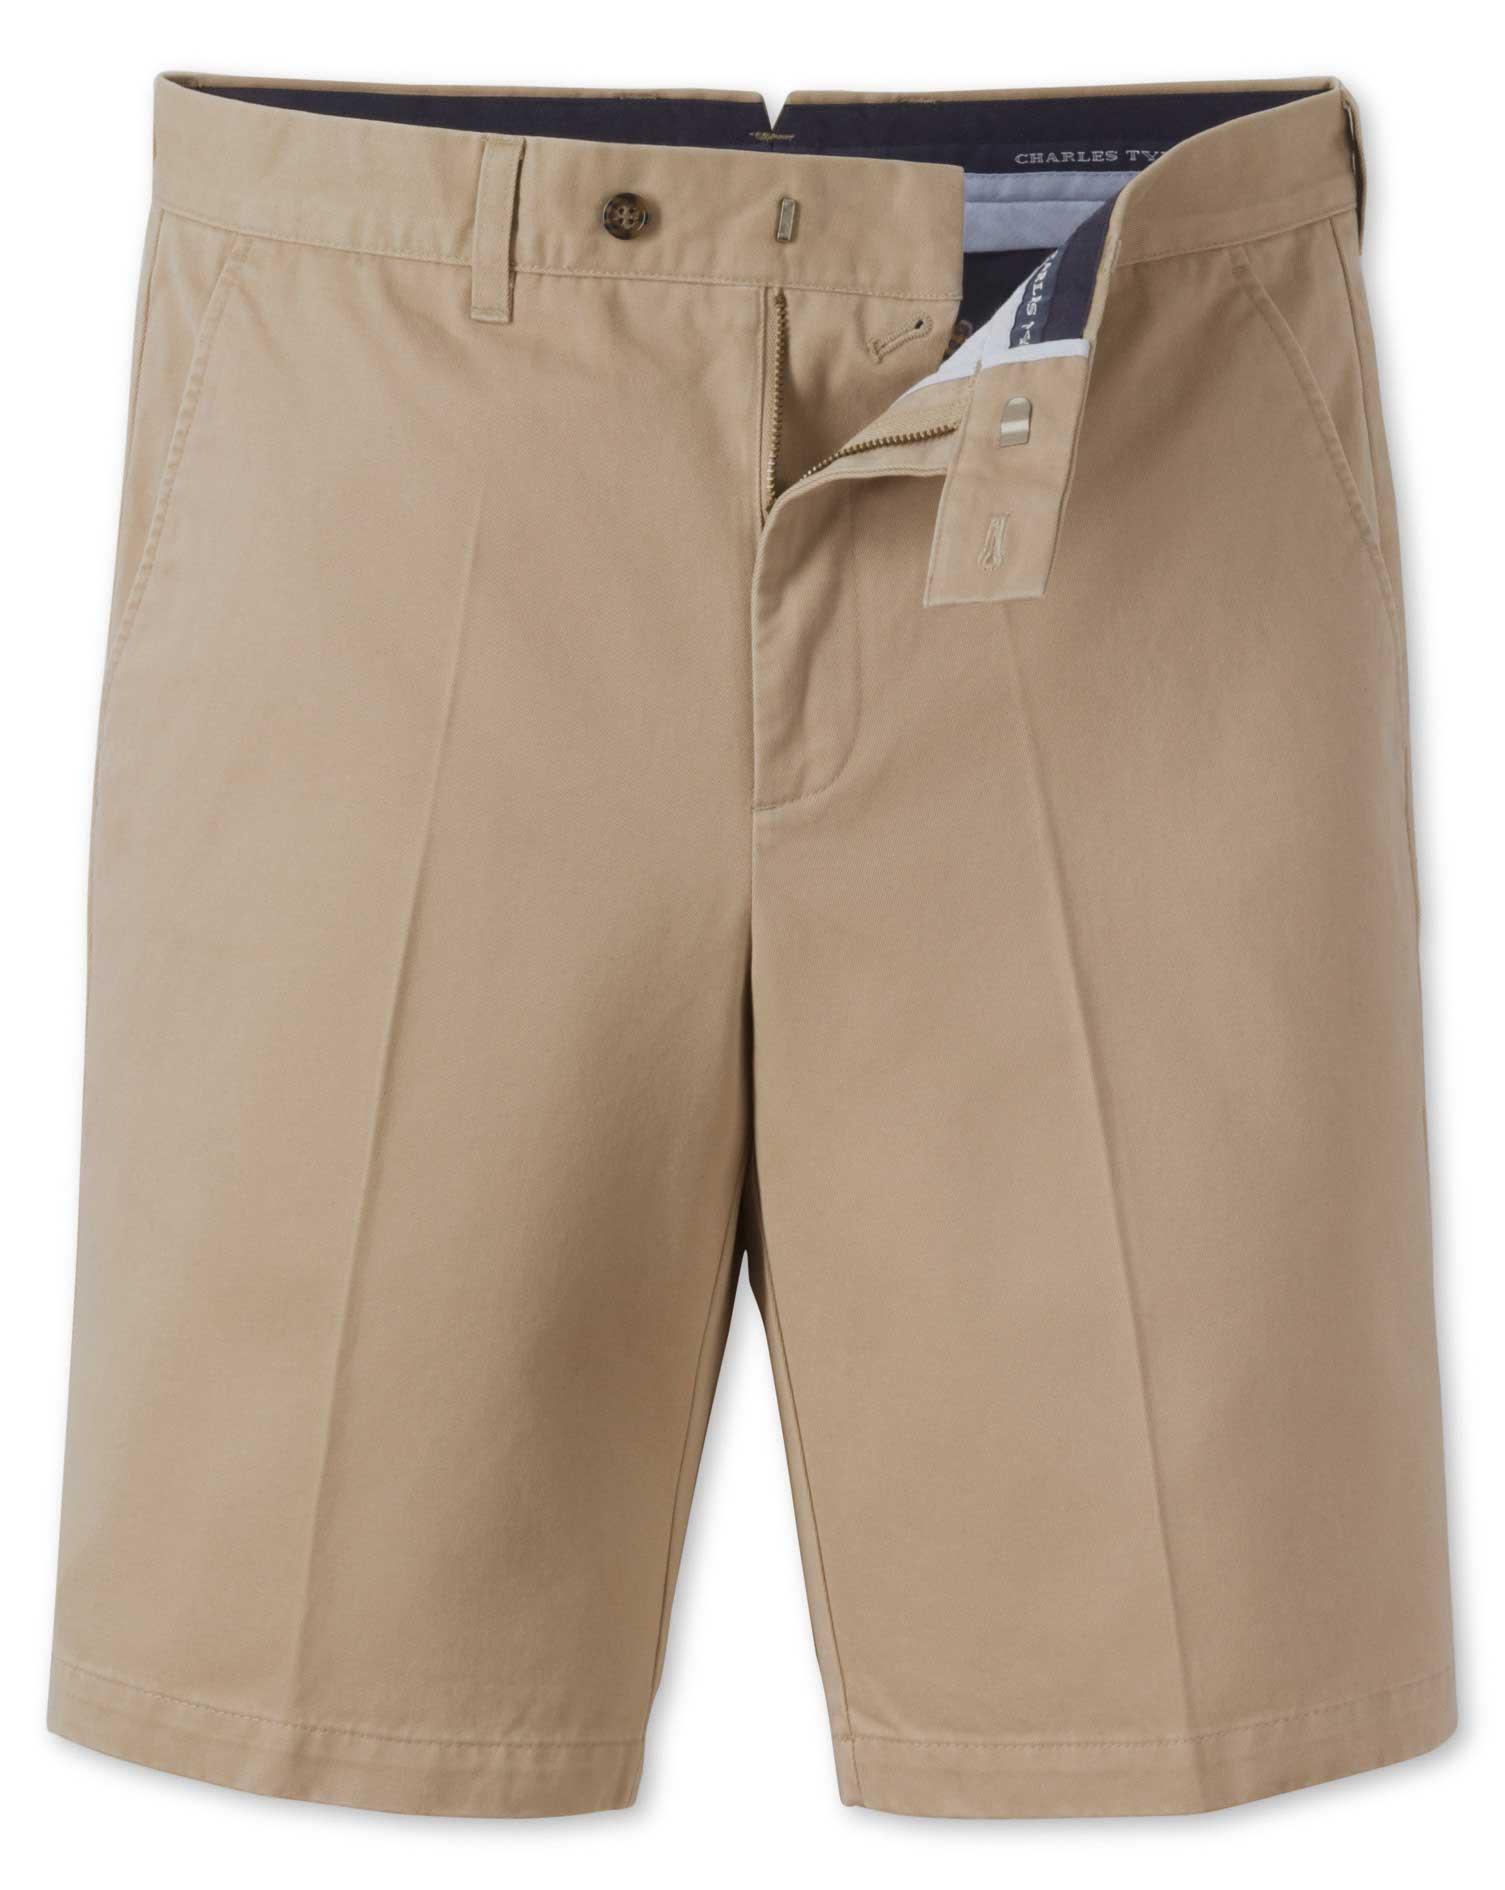 Stone Single Pleat Chino Cotton Shorts Size 30 by Charles Tyrwhitt